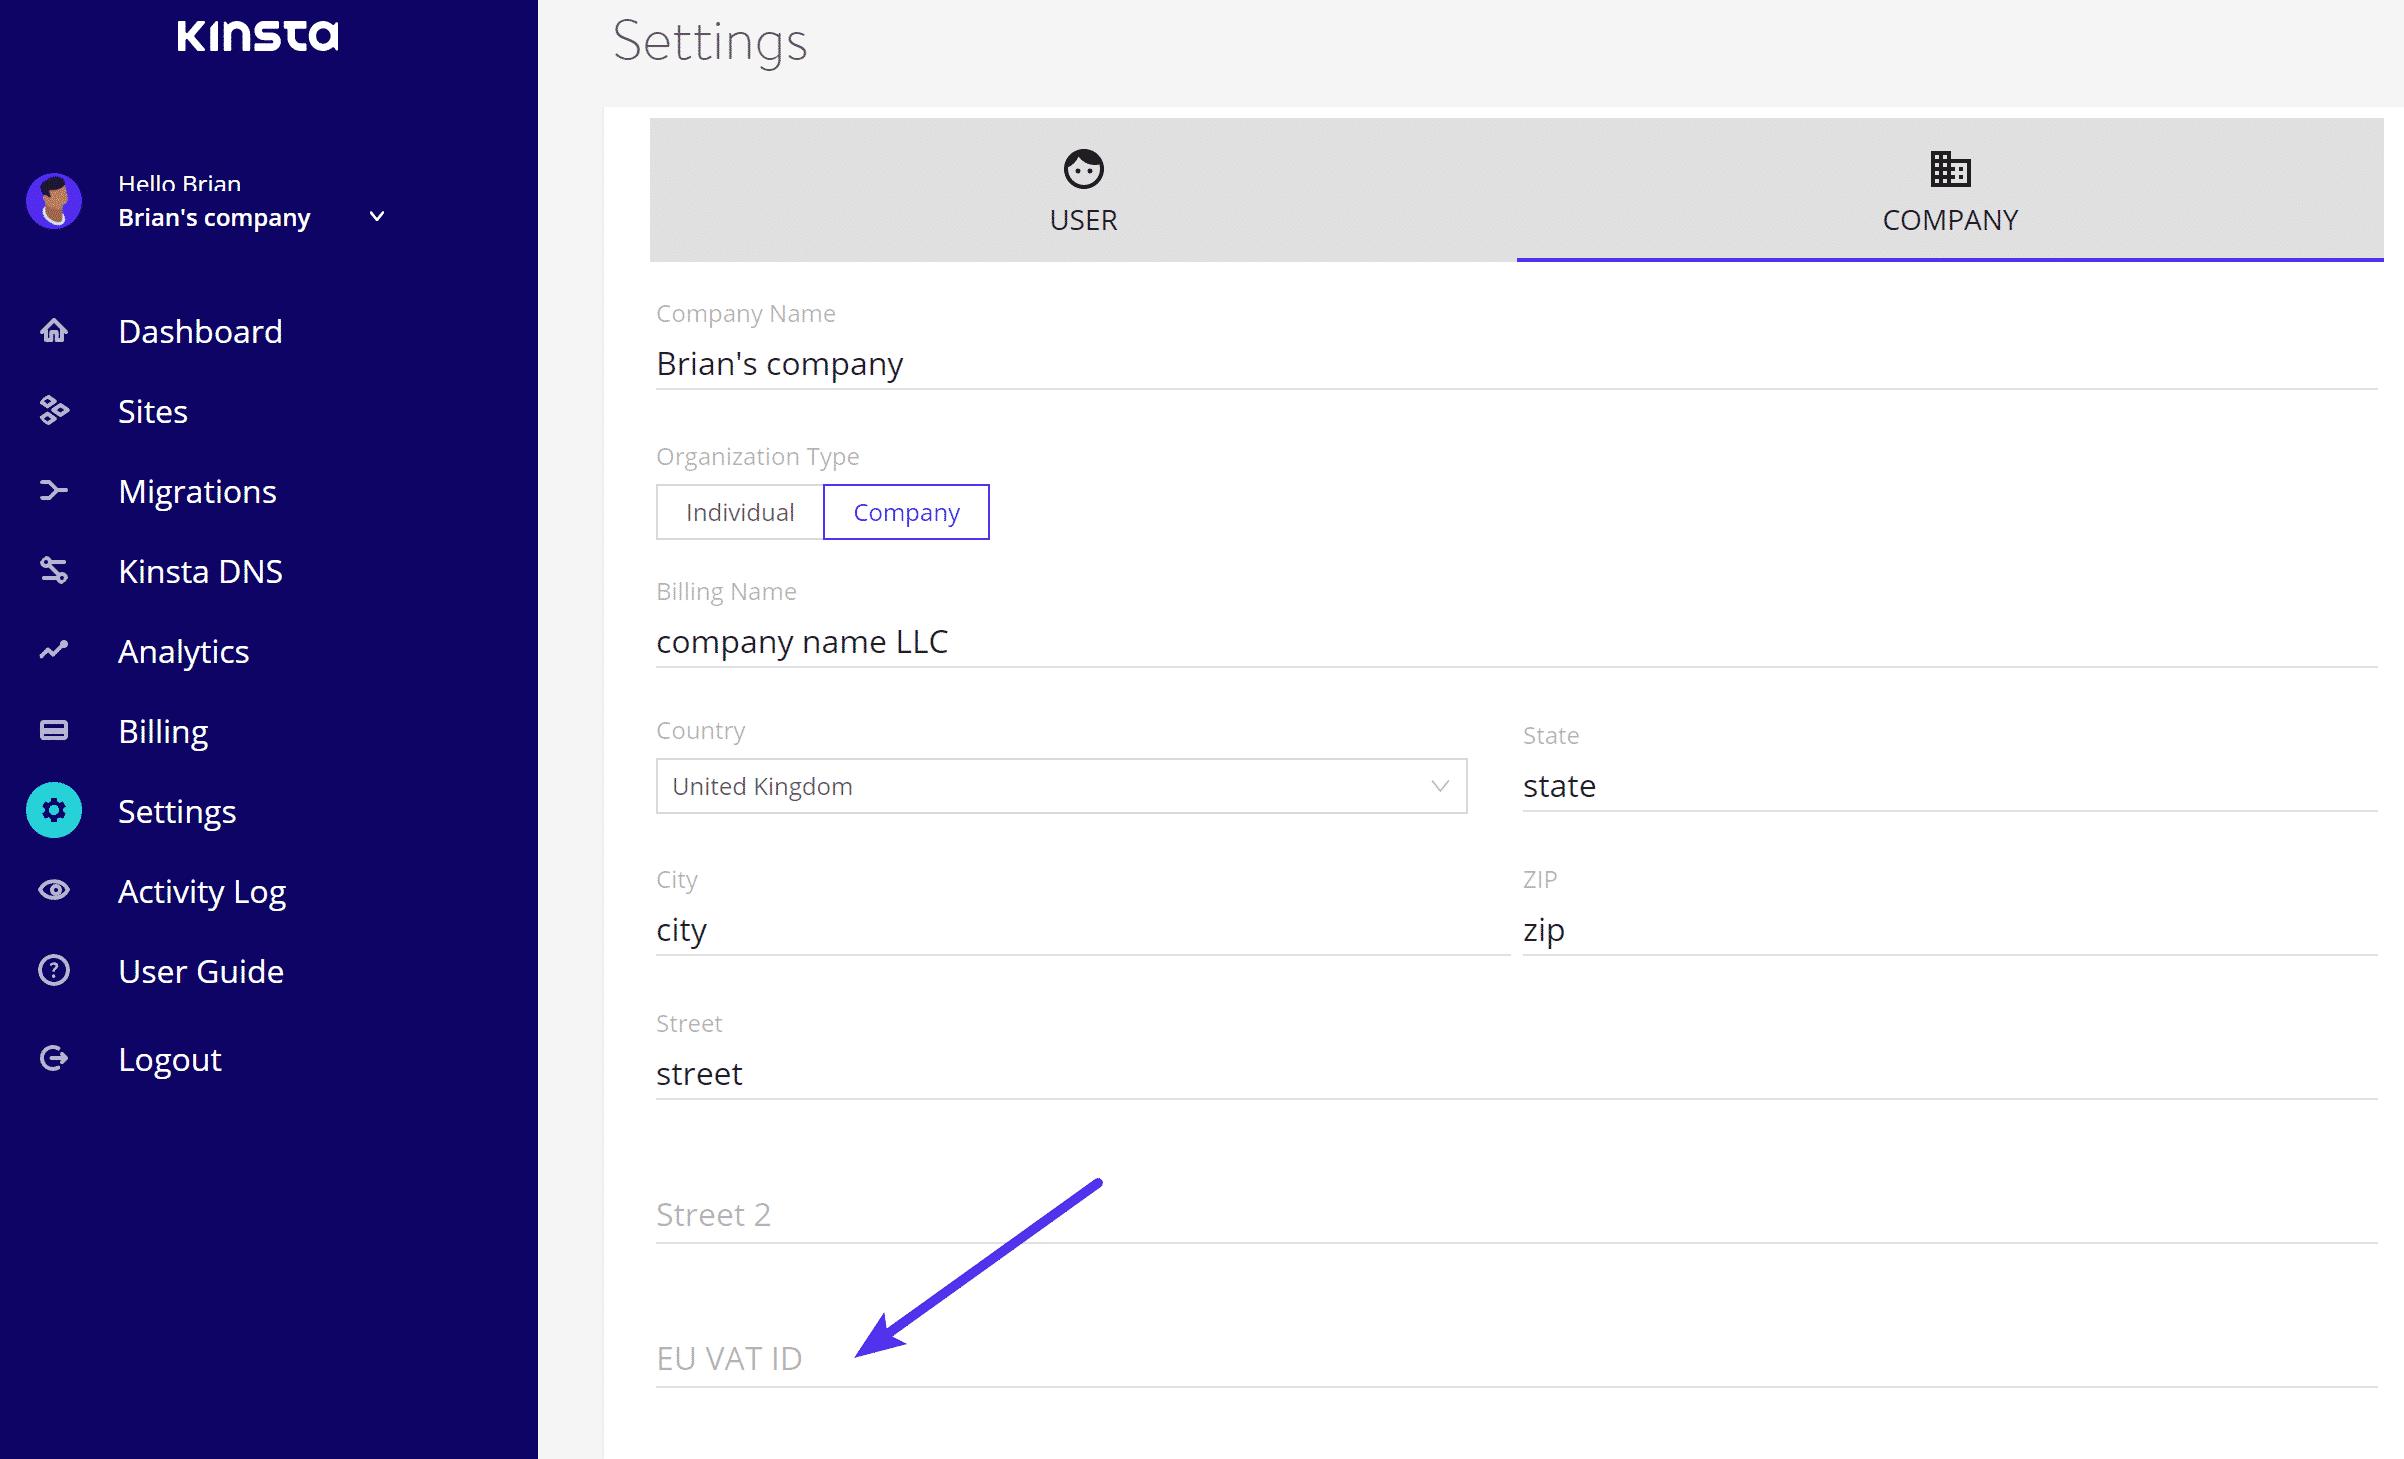 VAT ID da UE em MyKinsta